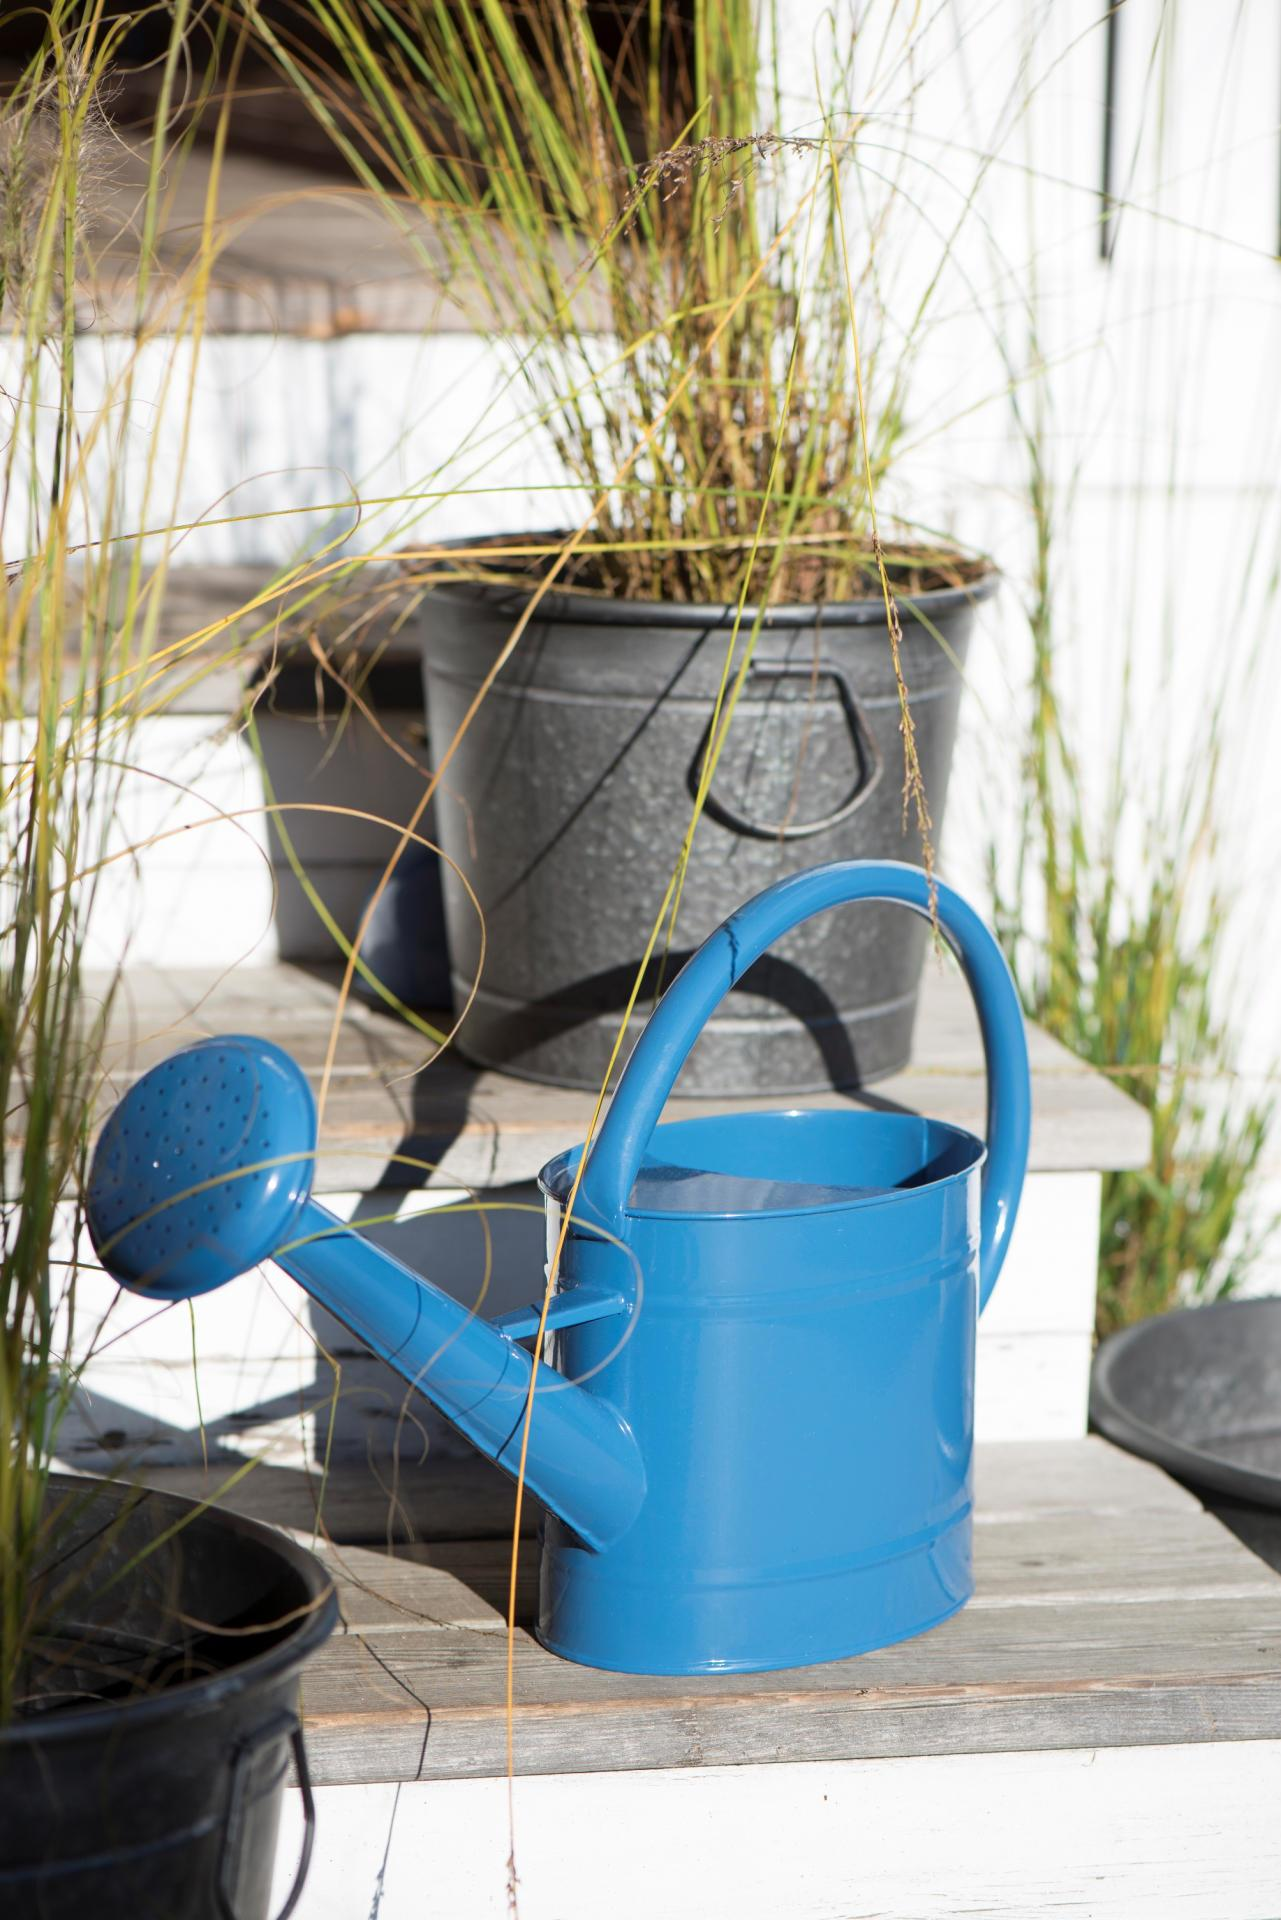 IB LAURSEN Zahradní konev Blue 5 l